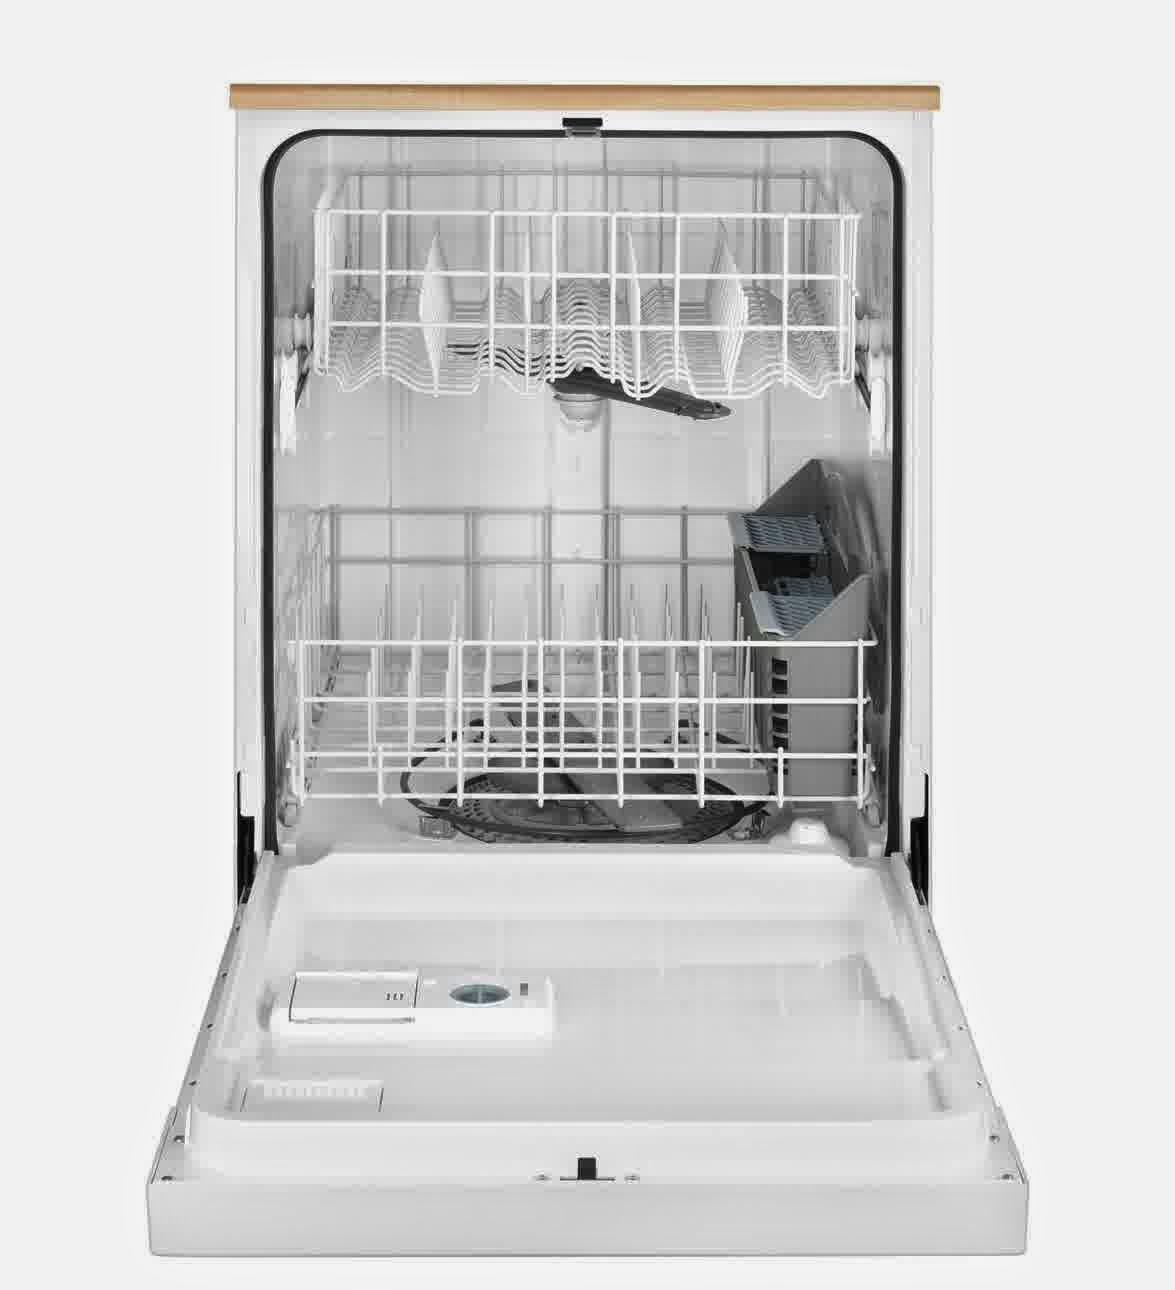 Maytag Portable Dishwasher Reviews